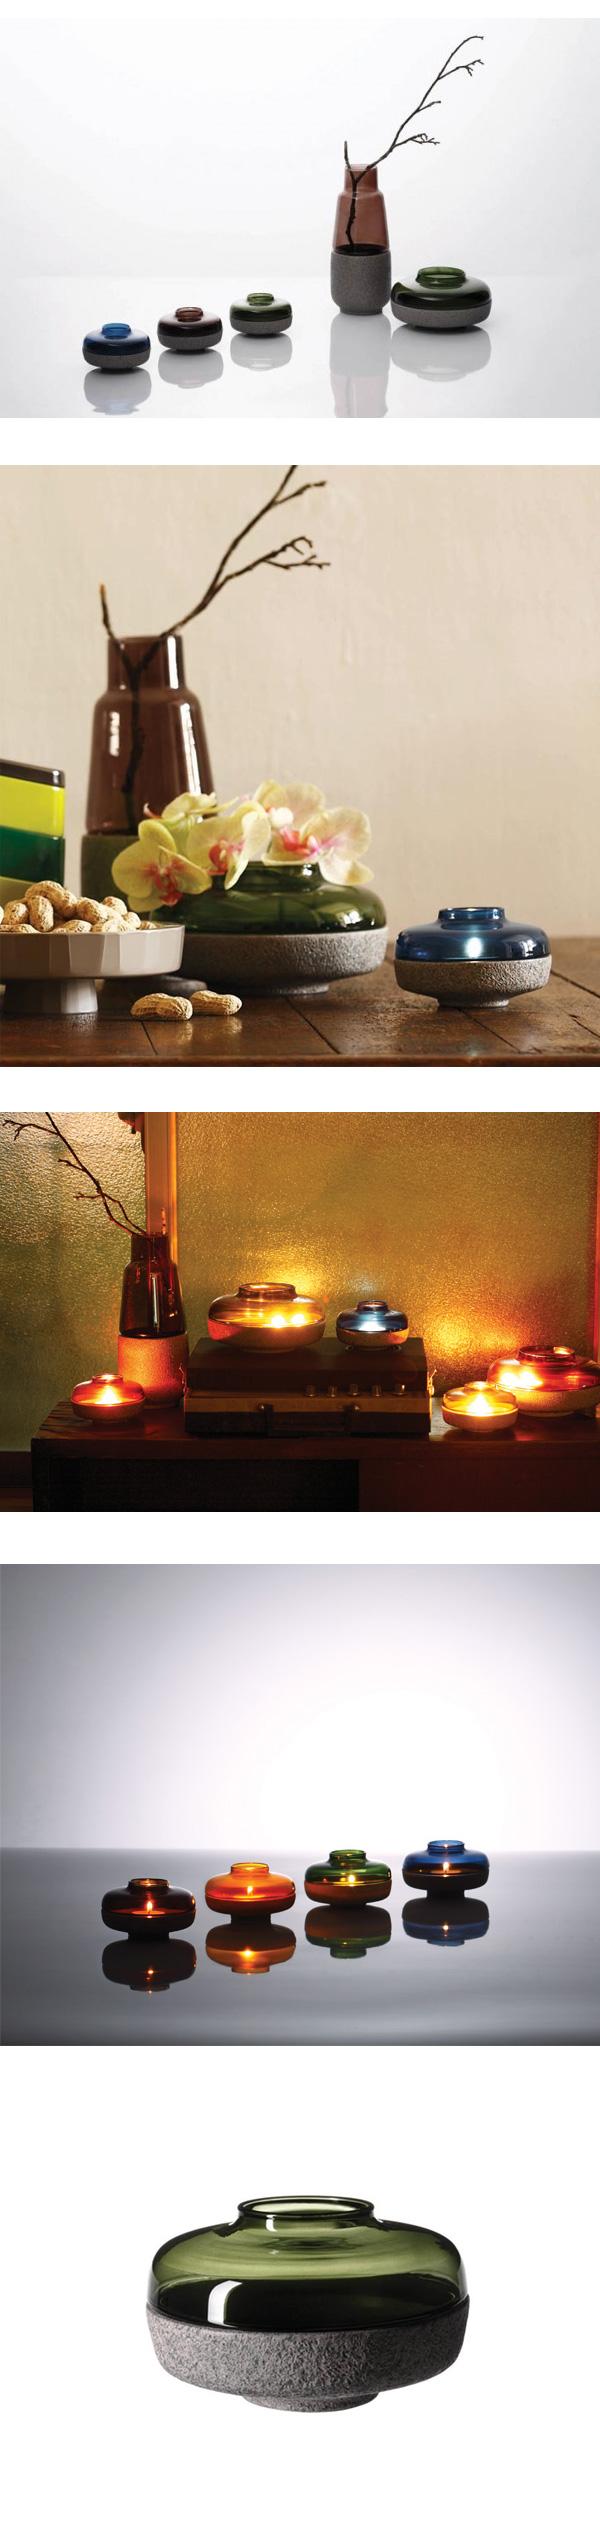 JIA Lantern & Shade 燈華系列 燭台 小尺寸,Kate Chung 設計 綠色